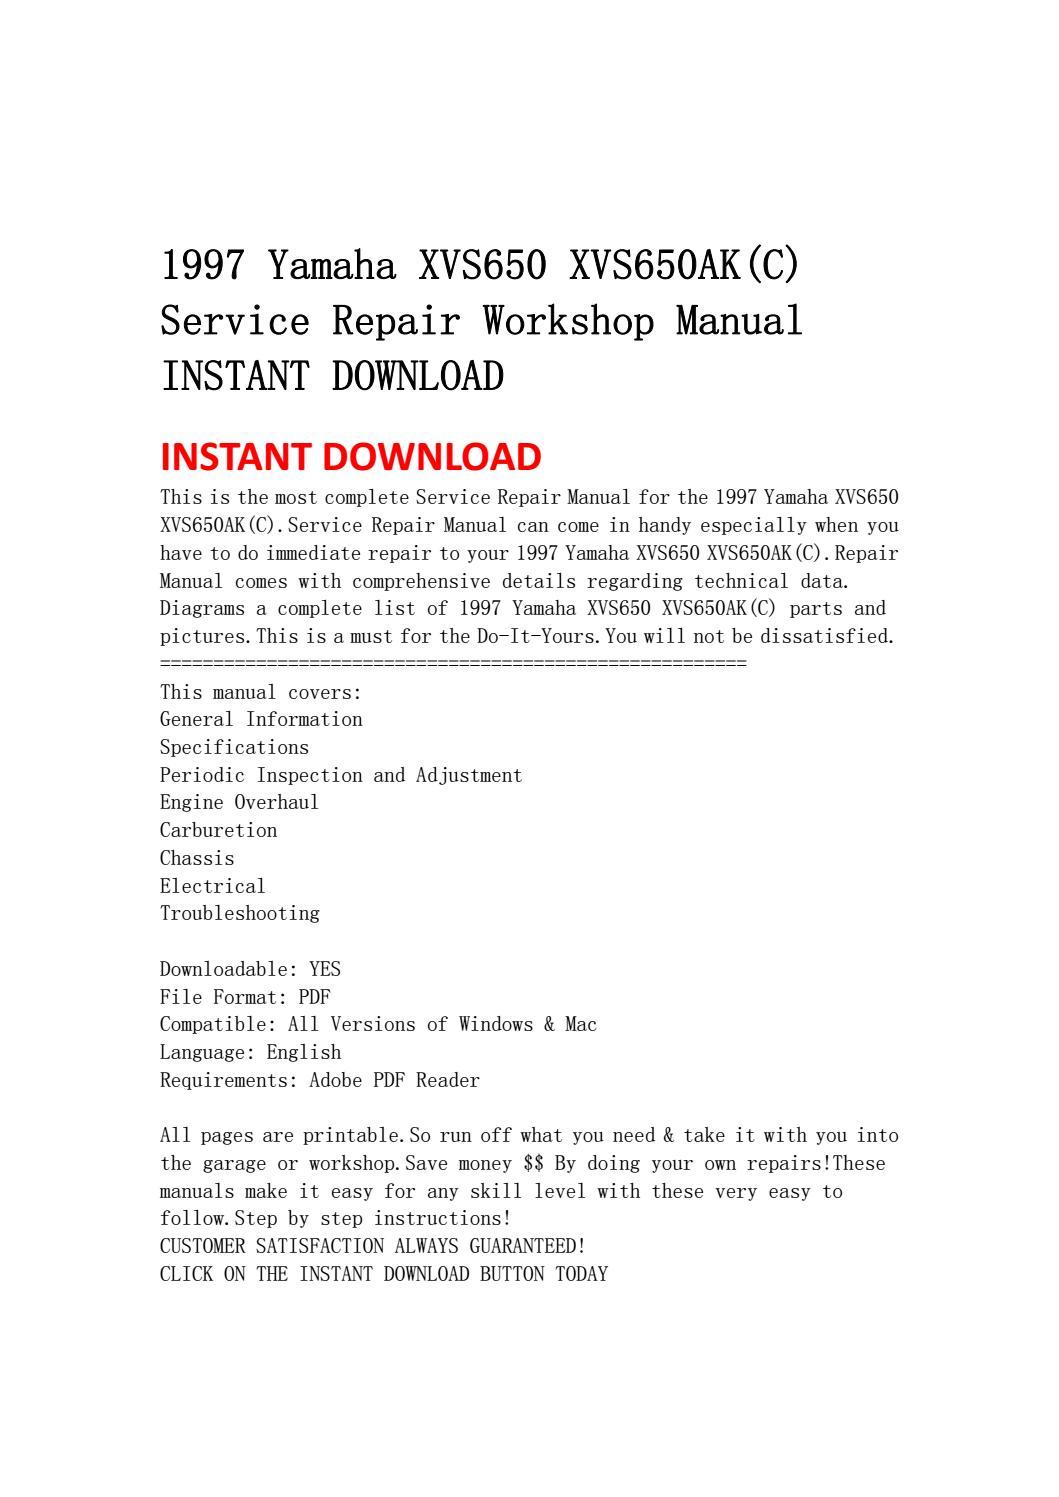 1997 yamaha xvs650 xvs650ak(c) service repair workshop manual instant  download by ksjefnsenfn - issuu